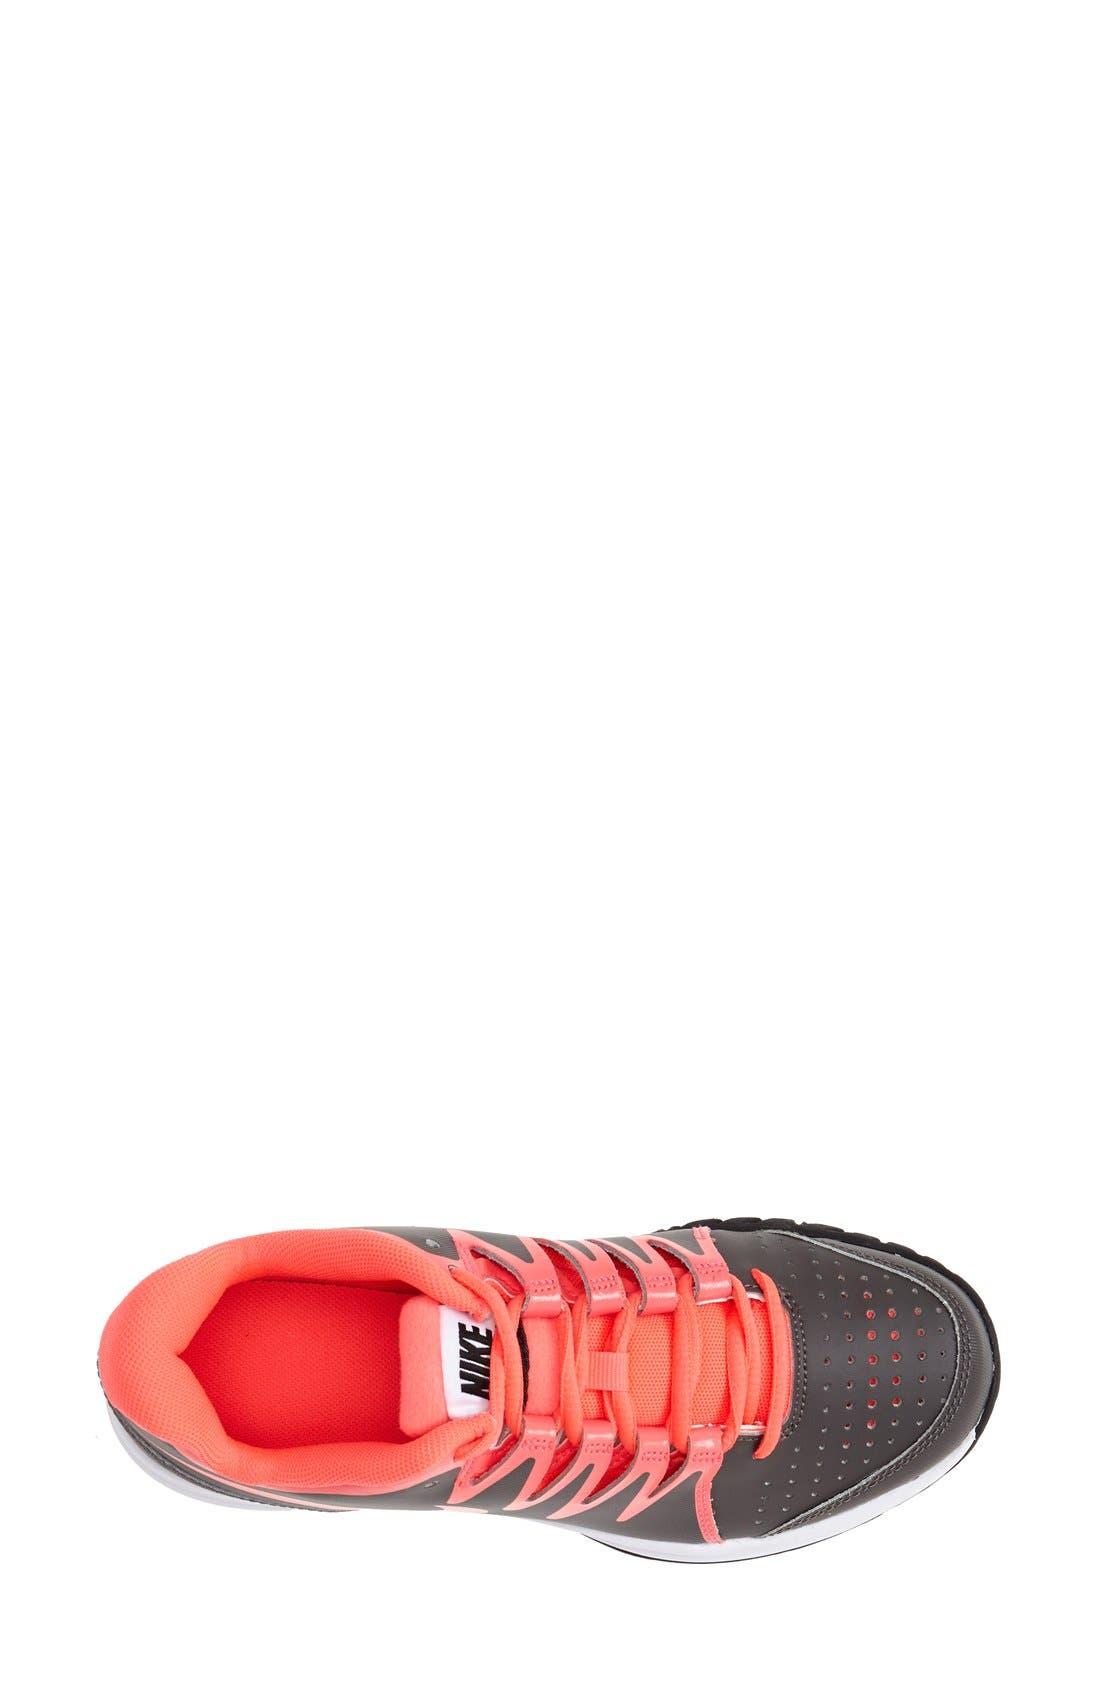 Alternate Image 3  - Nike 'Vapor Court' Tennis Shoe (Women)